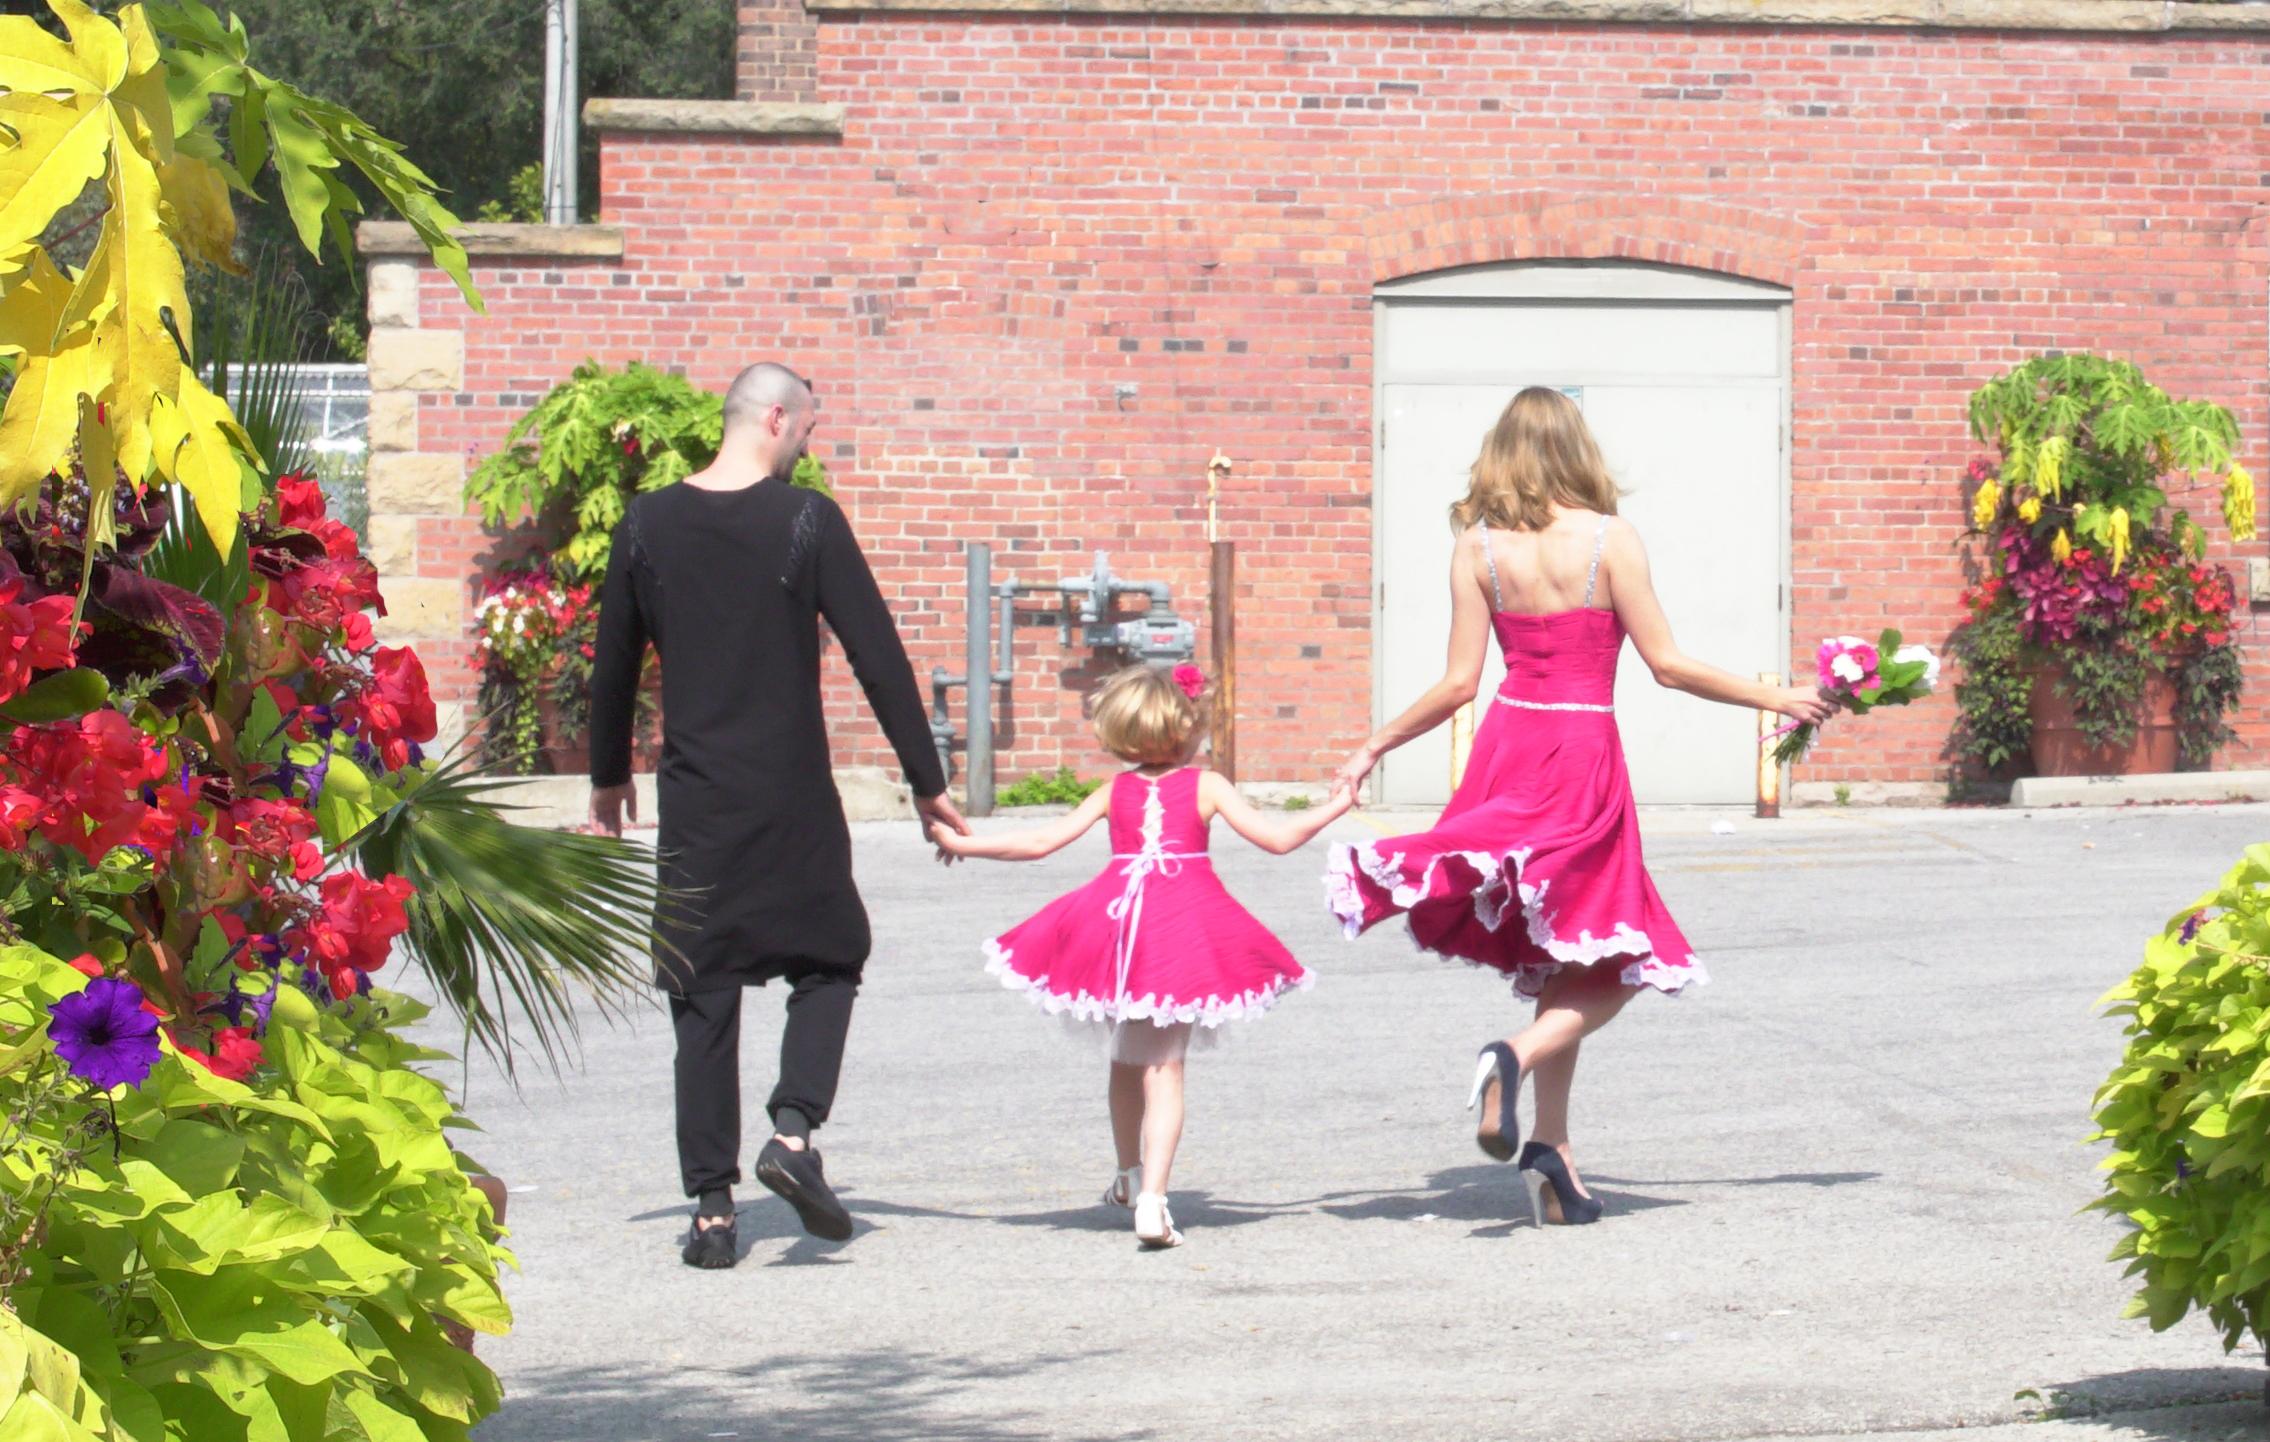 James serino   allen gardens   wedding   bridal   serino   pink